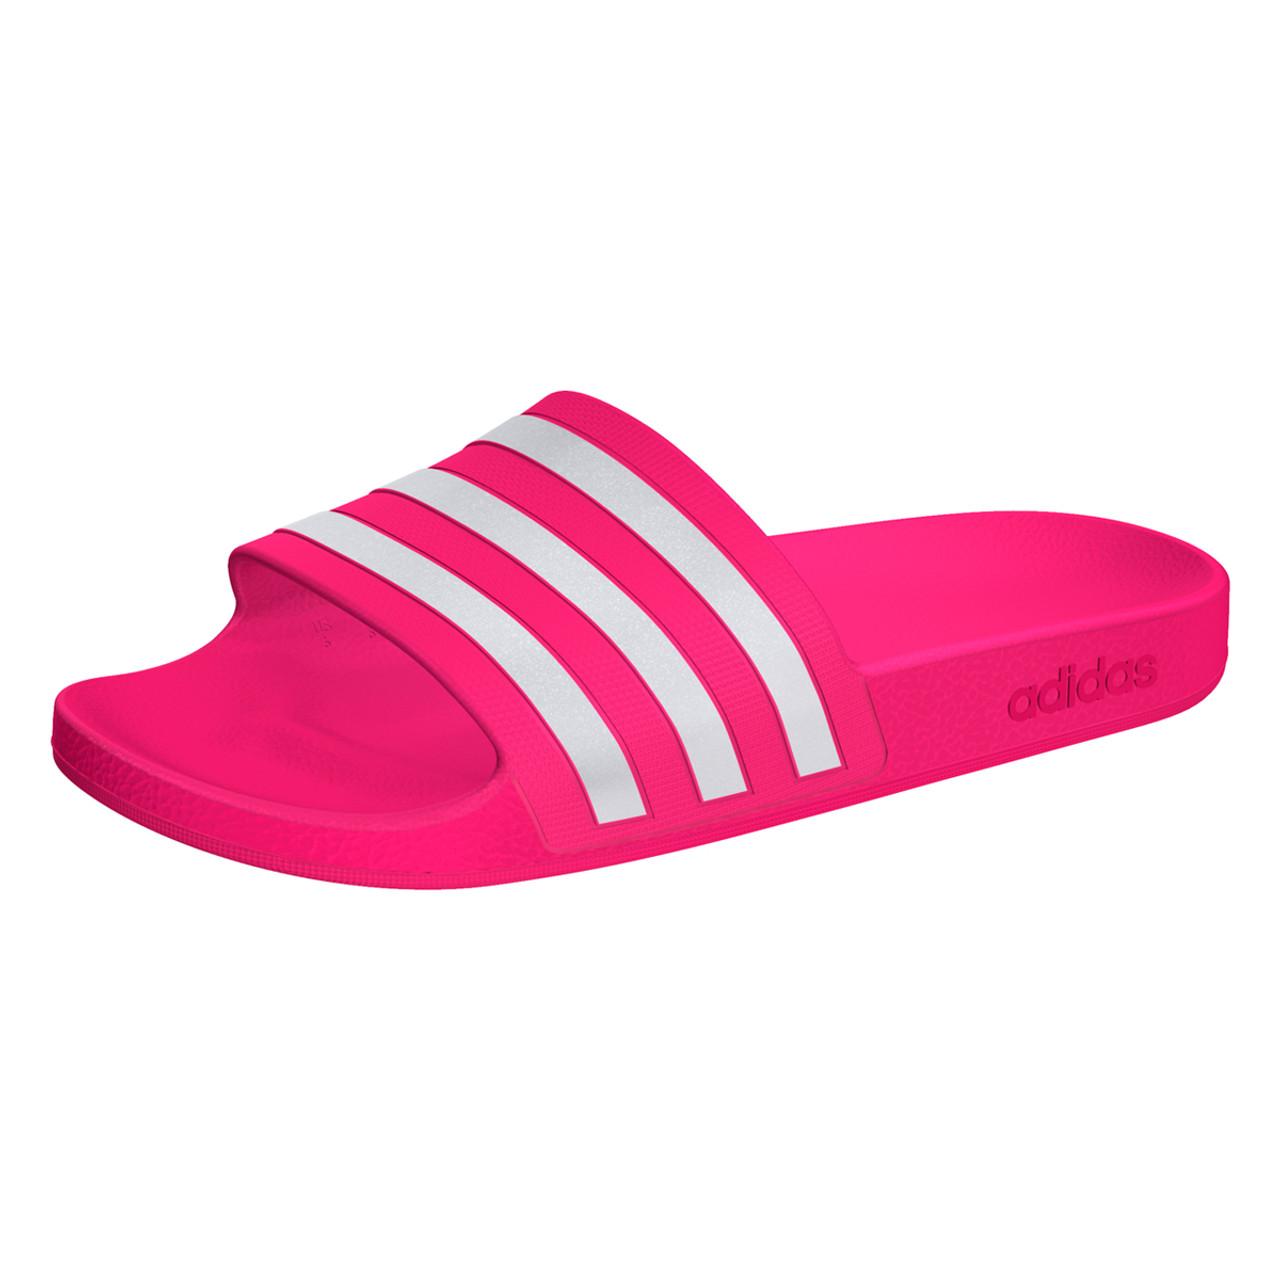 636aa4afbceeac Adidas Adilette Aqua Women s Sandals G28716 - White